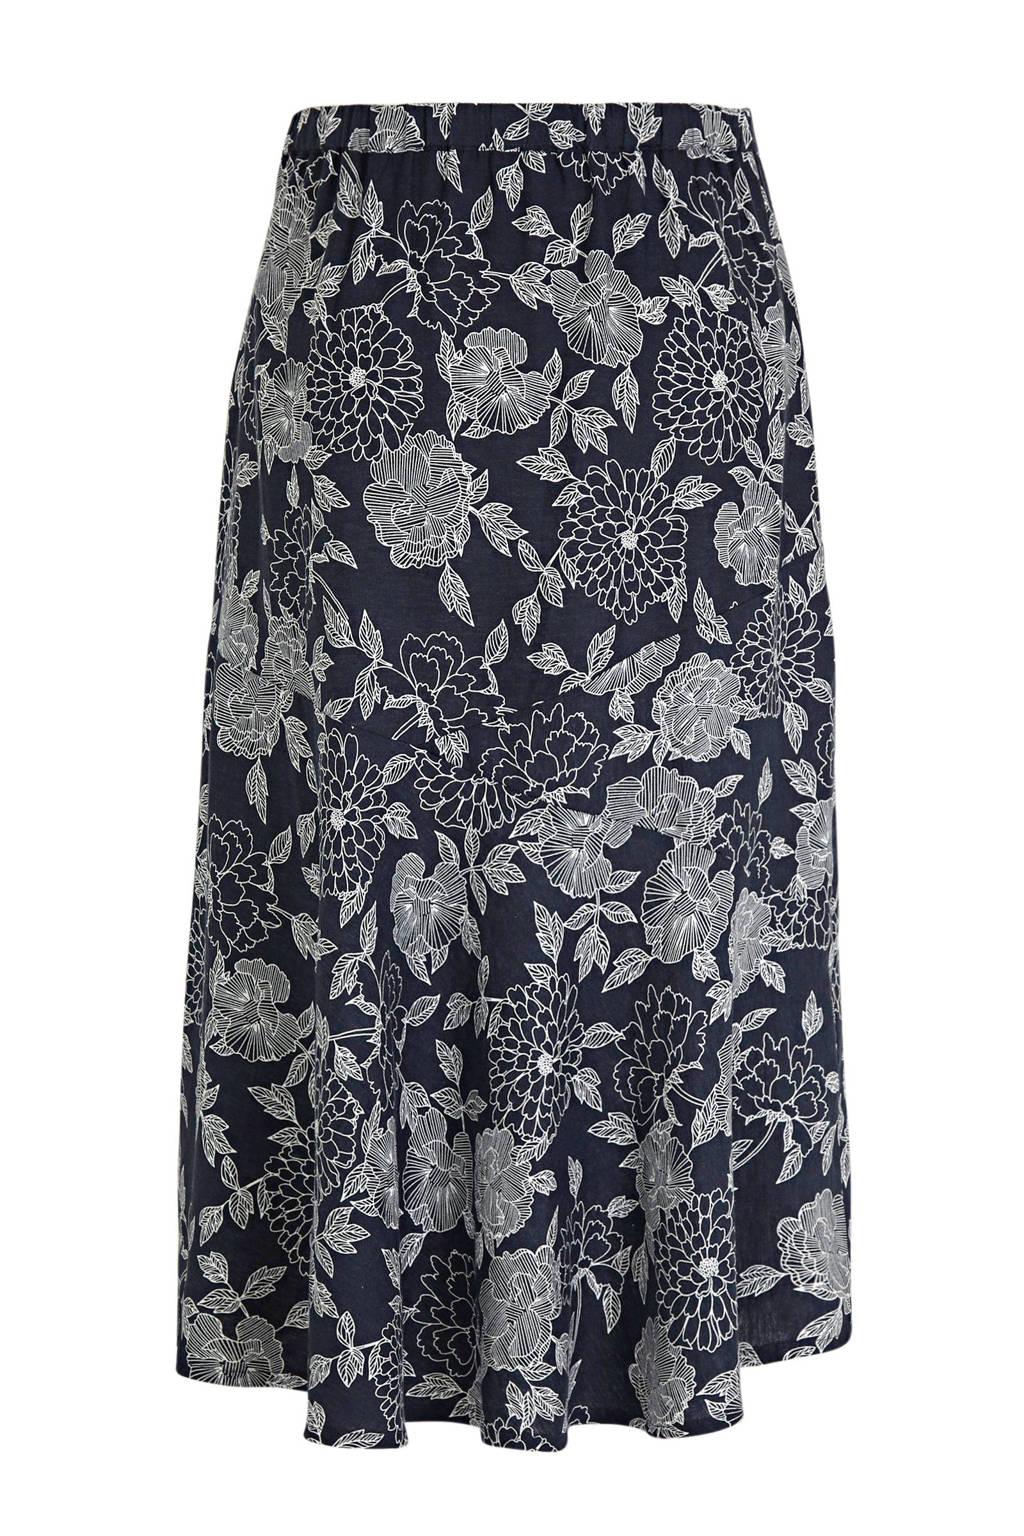 Julipa gebloemde rok donkerblauw/wit, Donkerblauw/wit